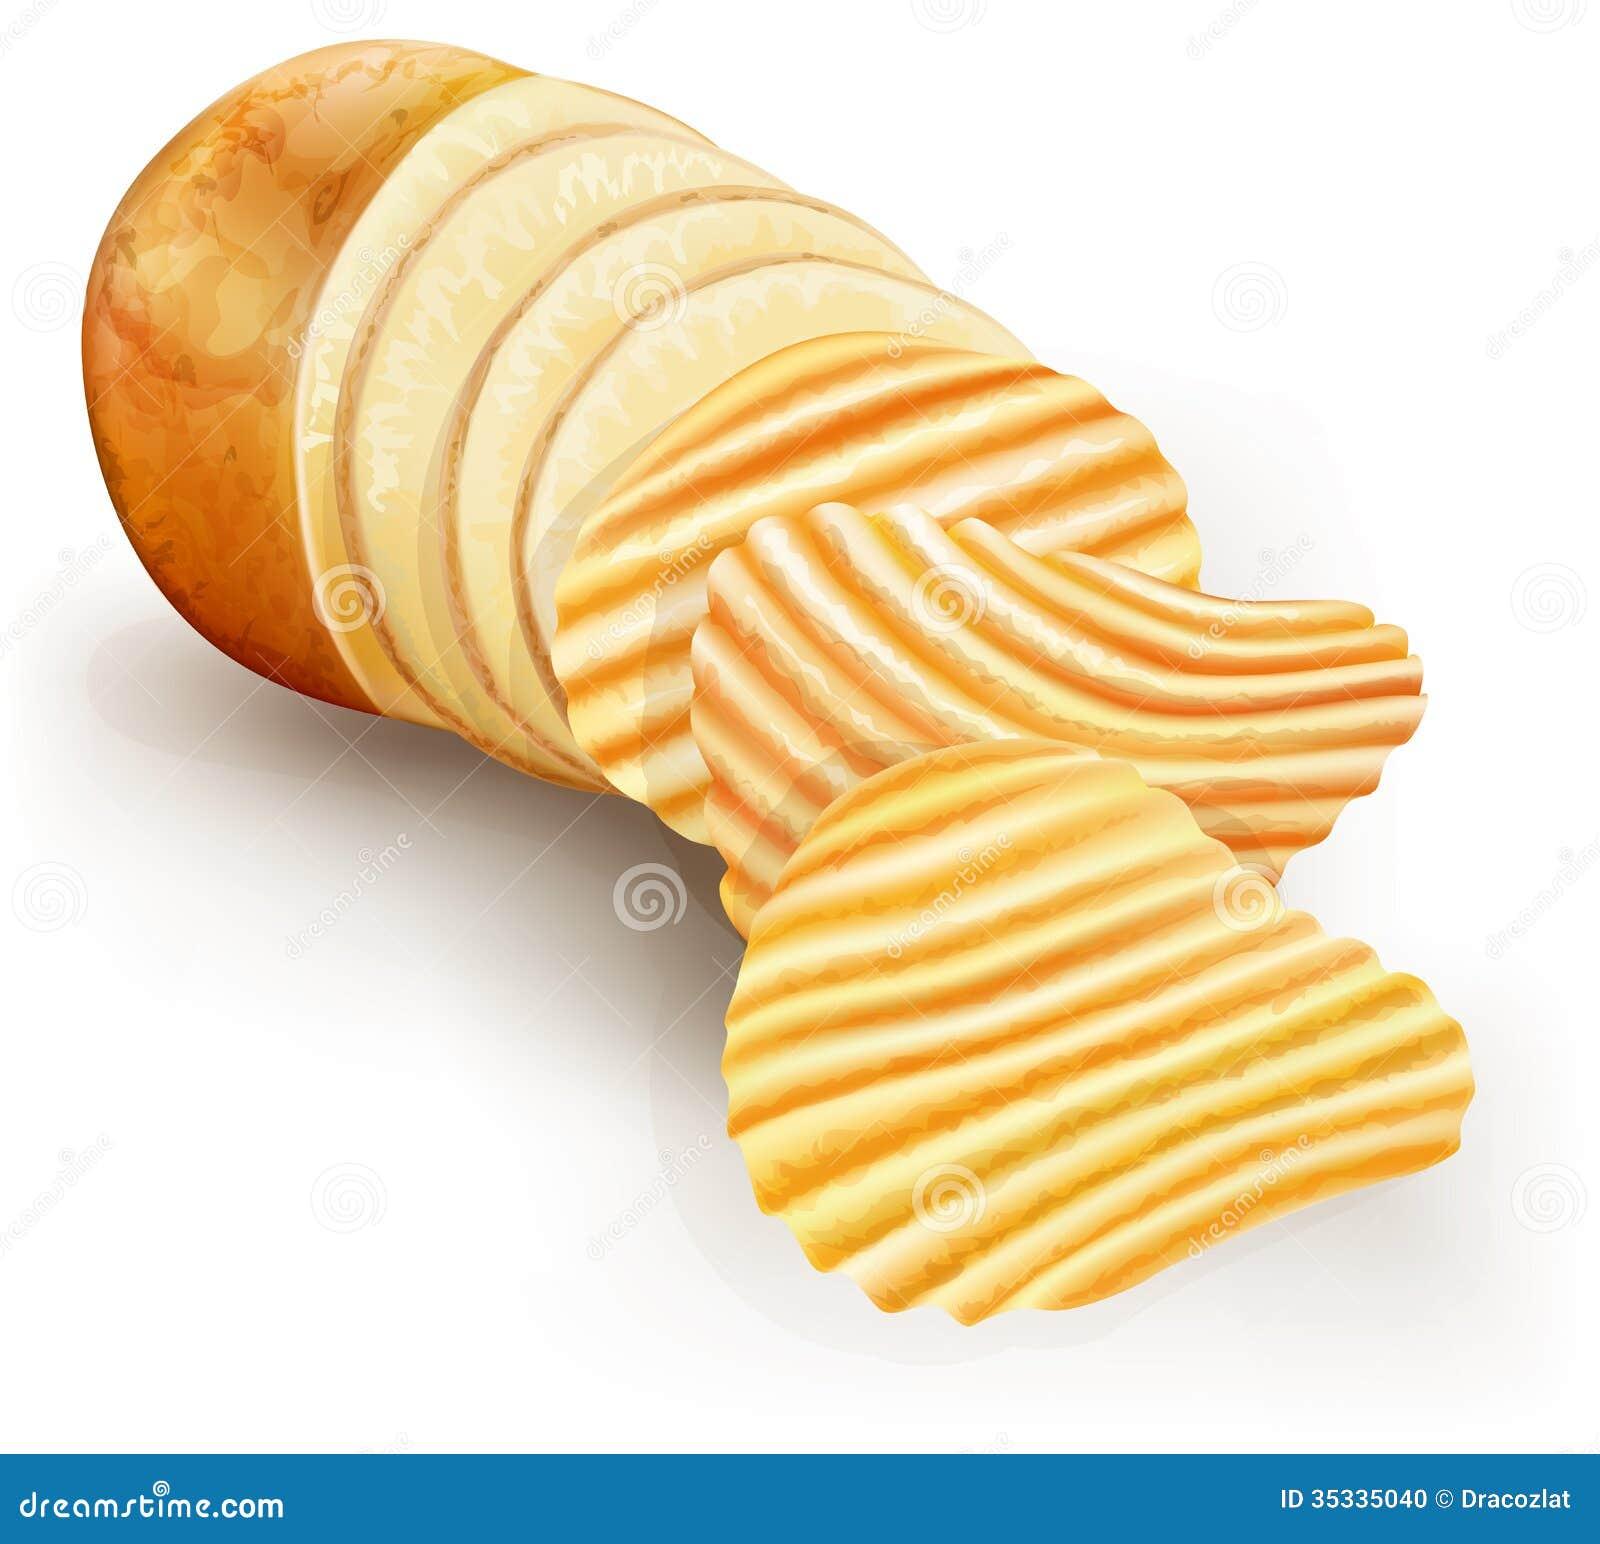 Wavy potato chips stock vector. Image of potatoes, fast ...